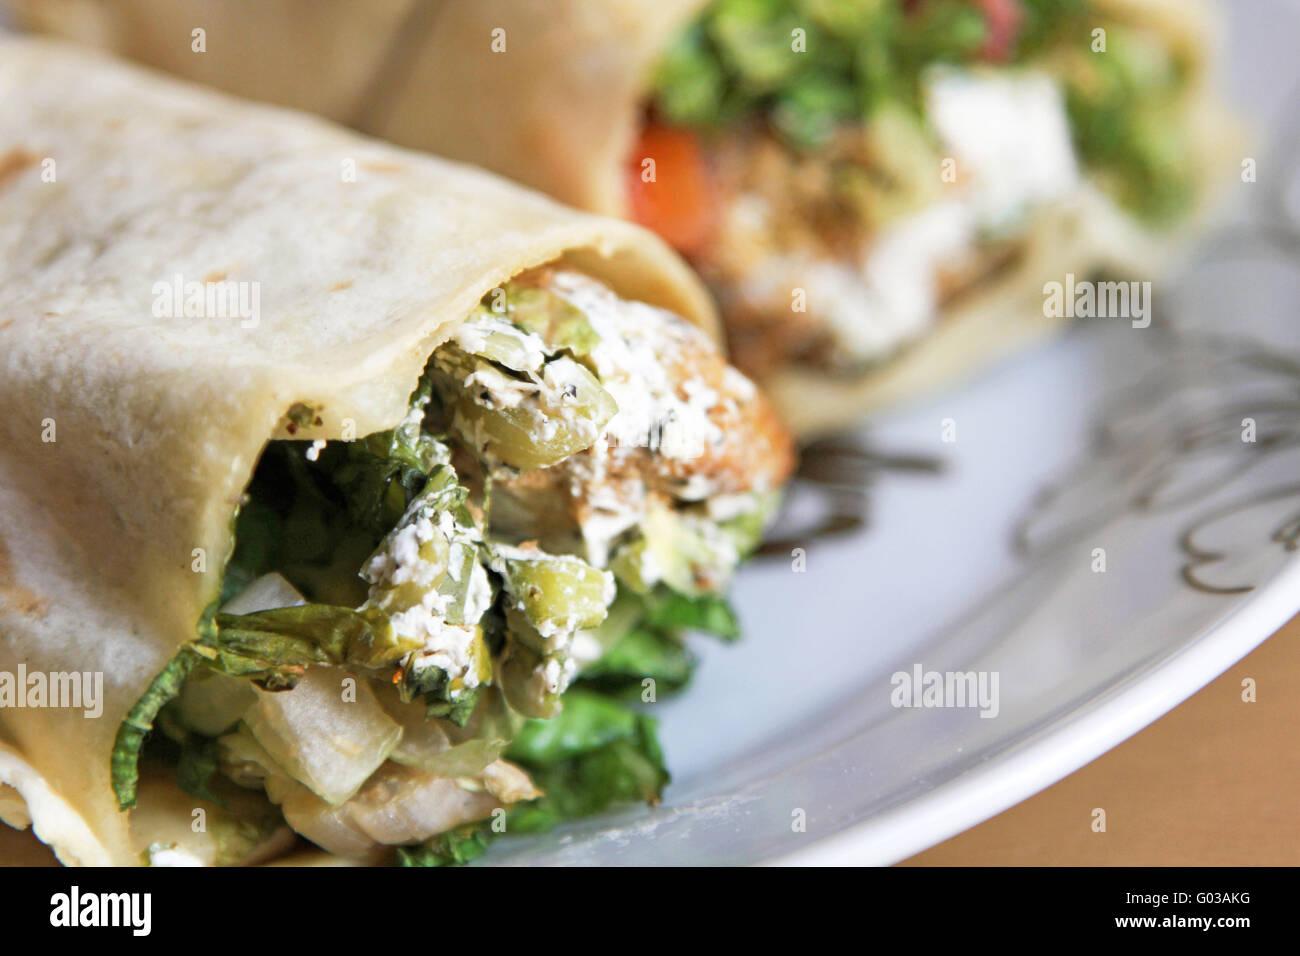 Arabic Wrap sandwich - Stock Image